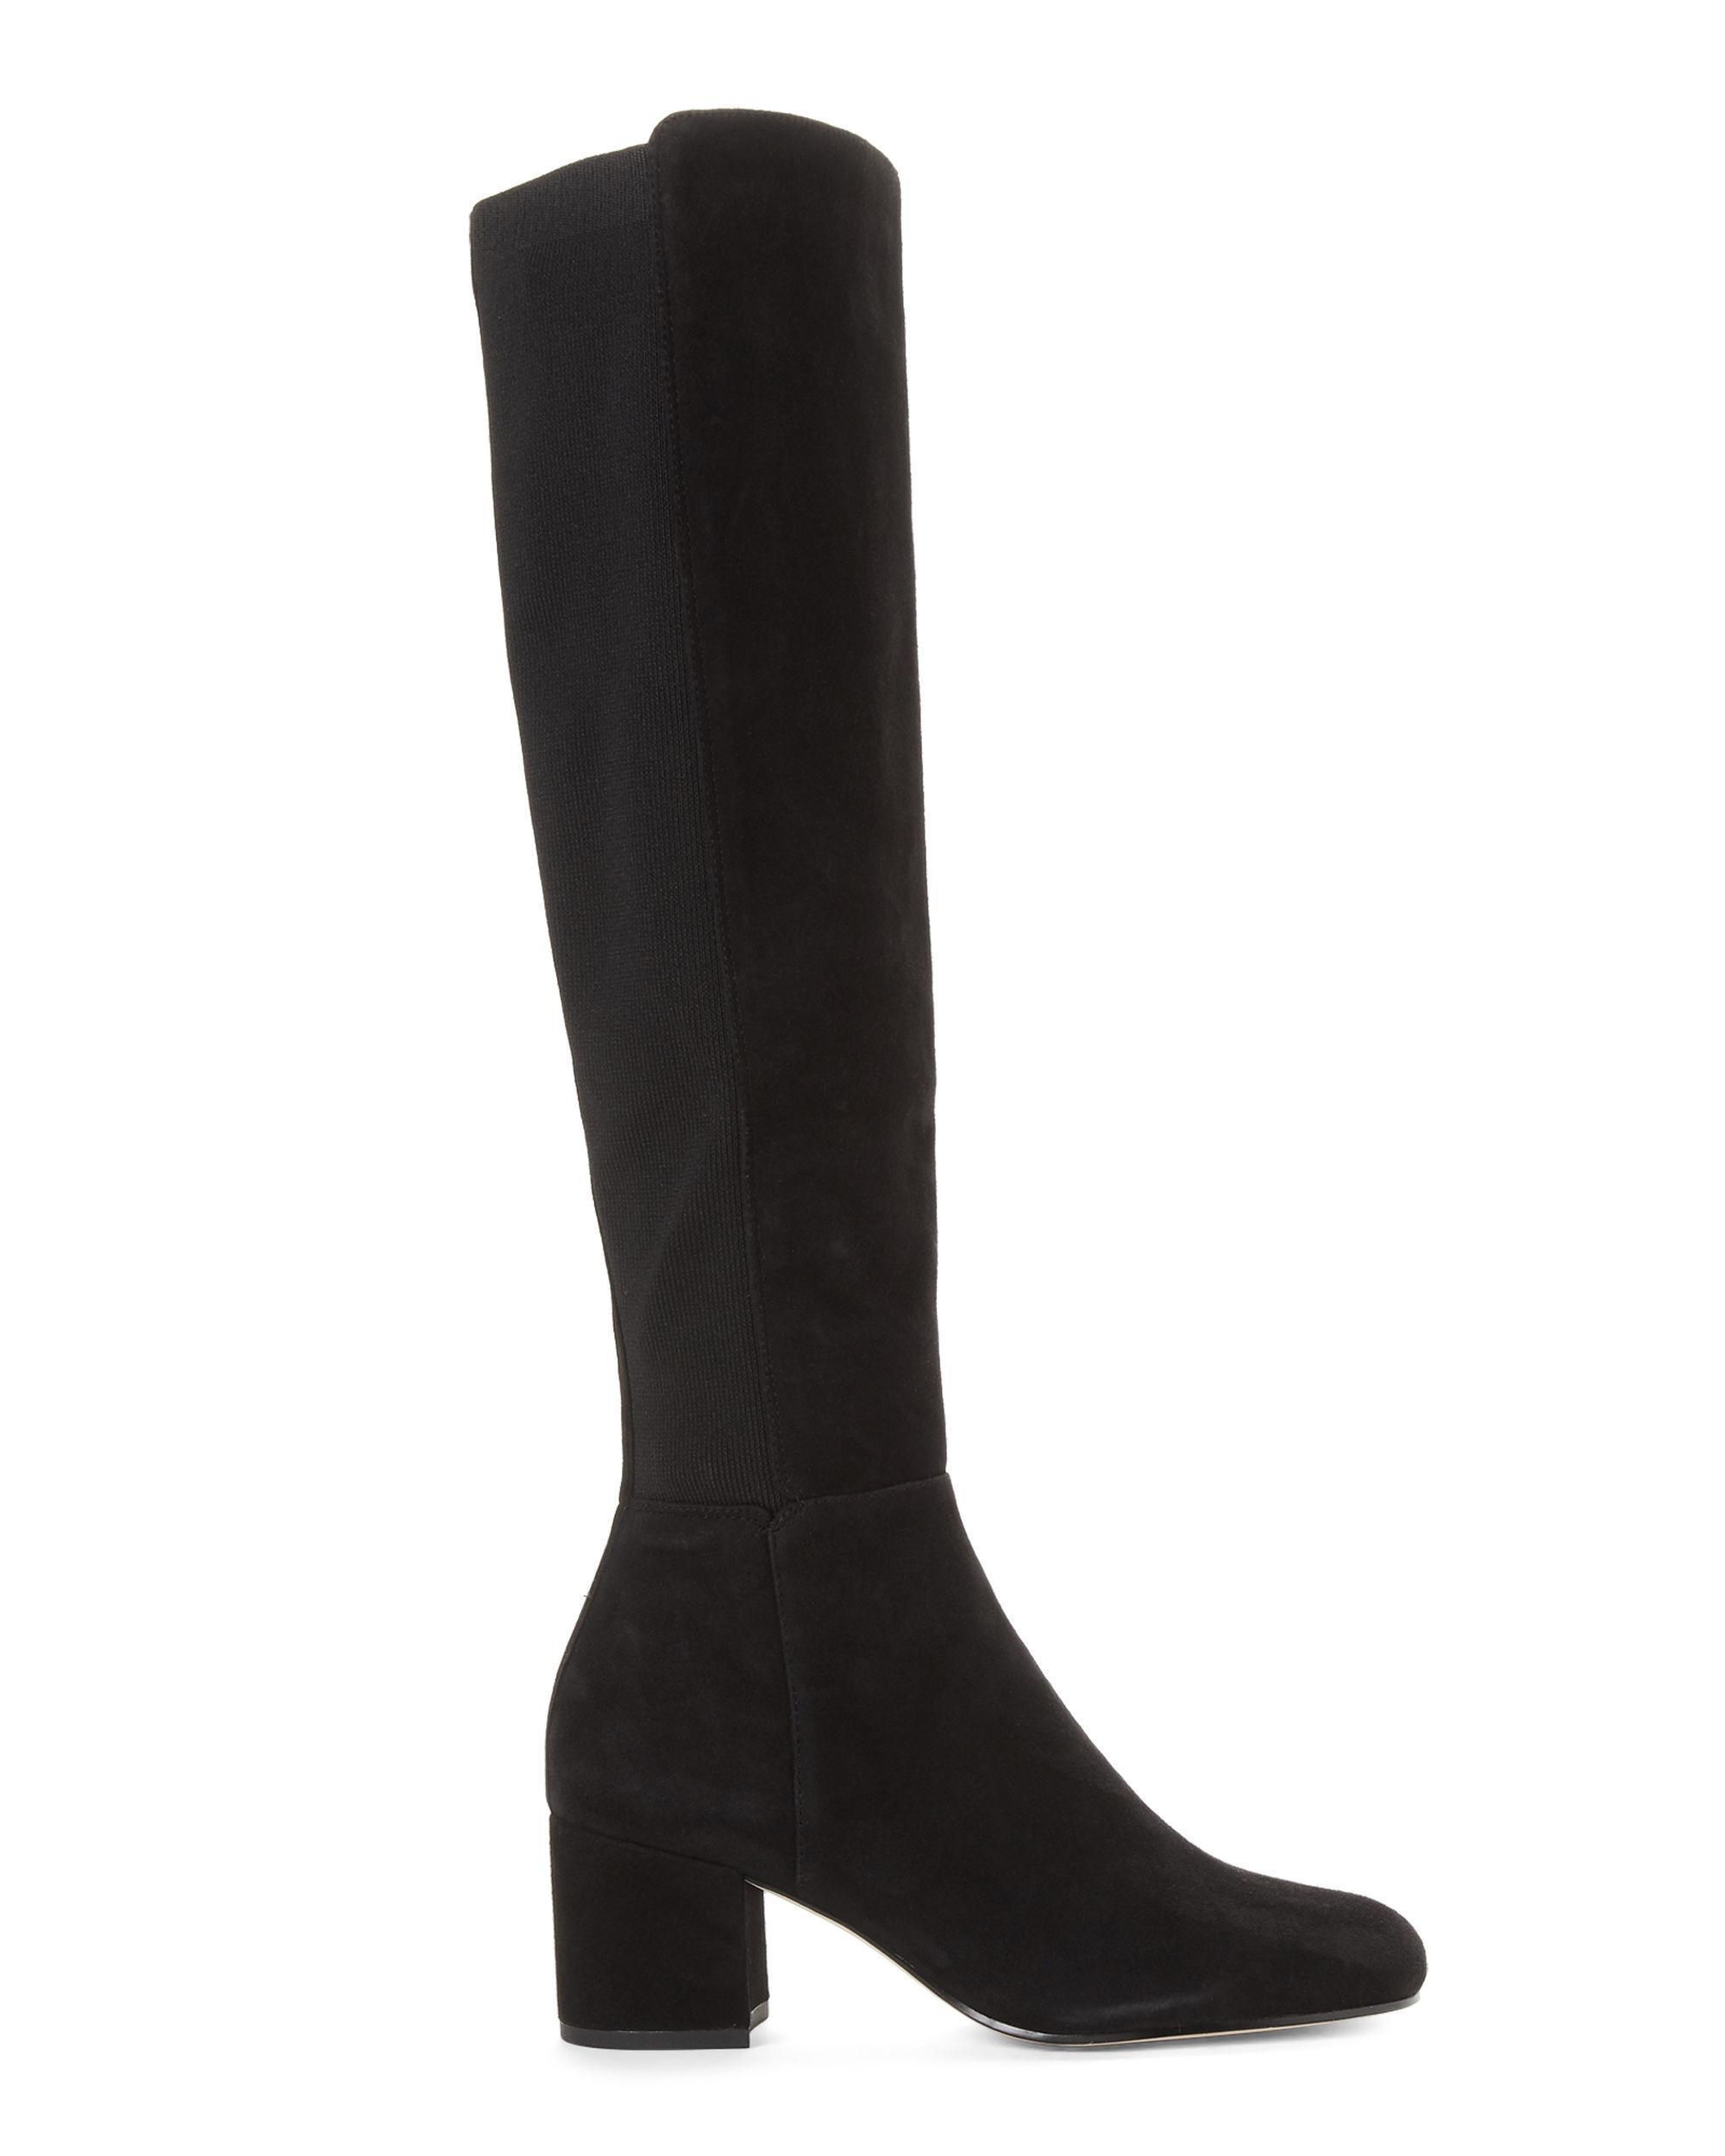 721ecbf8dc80 Lyst - Sam Edelman Black Valda Suede Knee-high Boots in Black